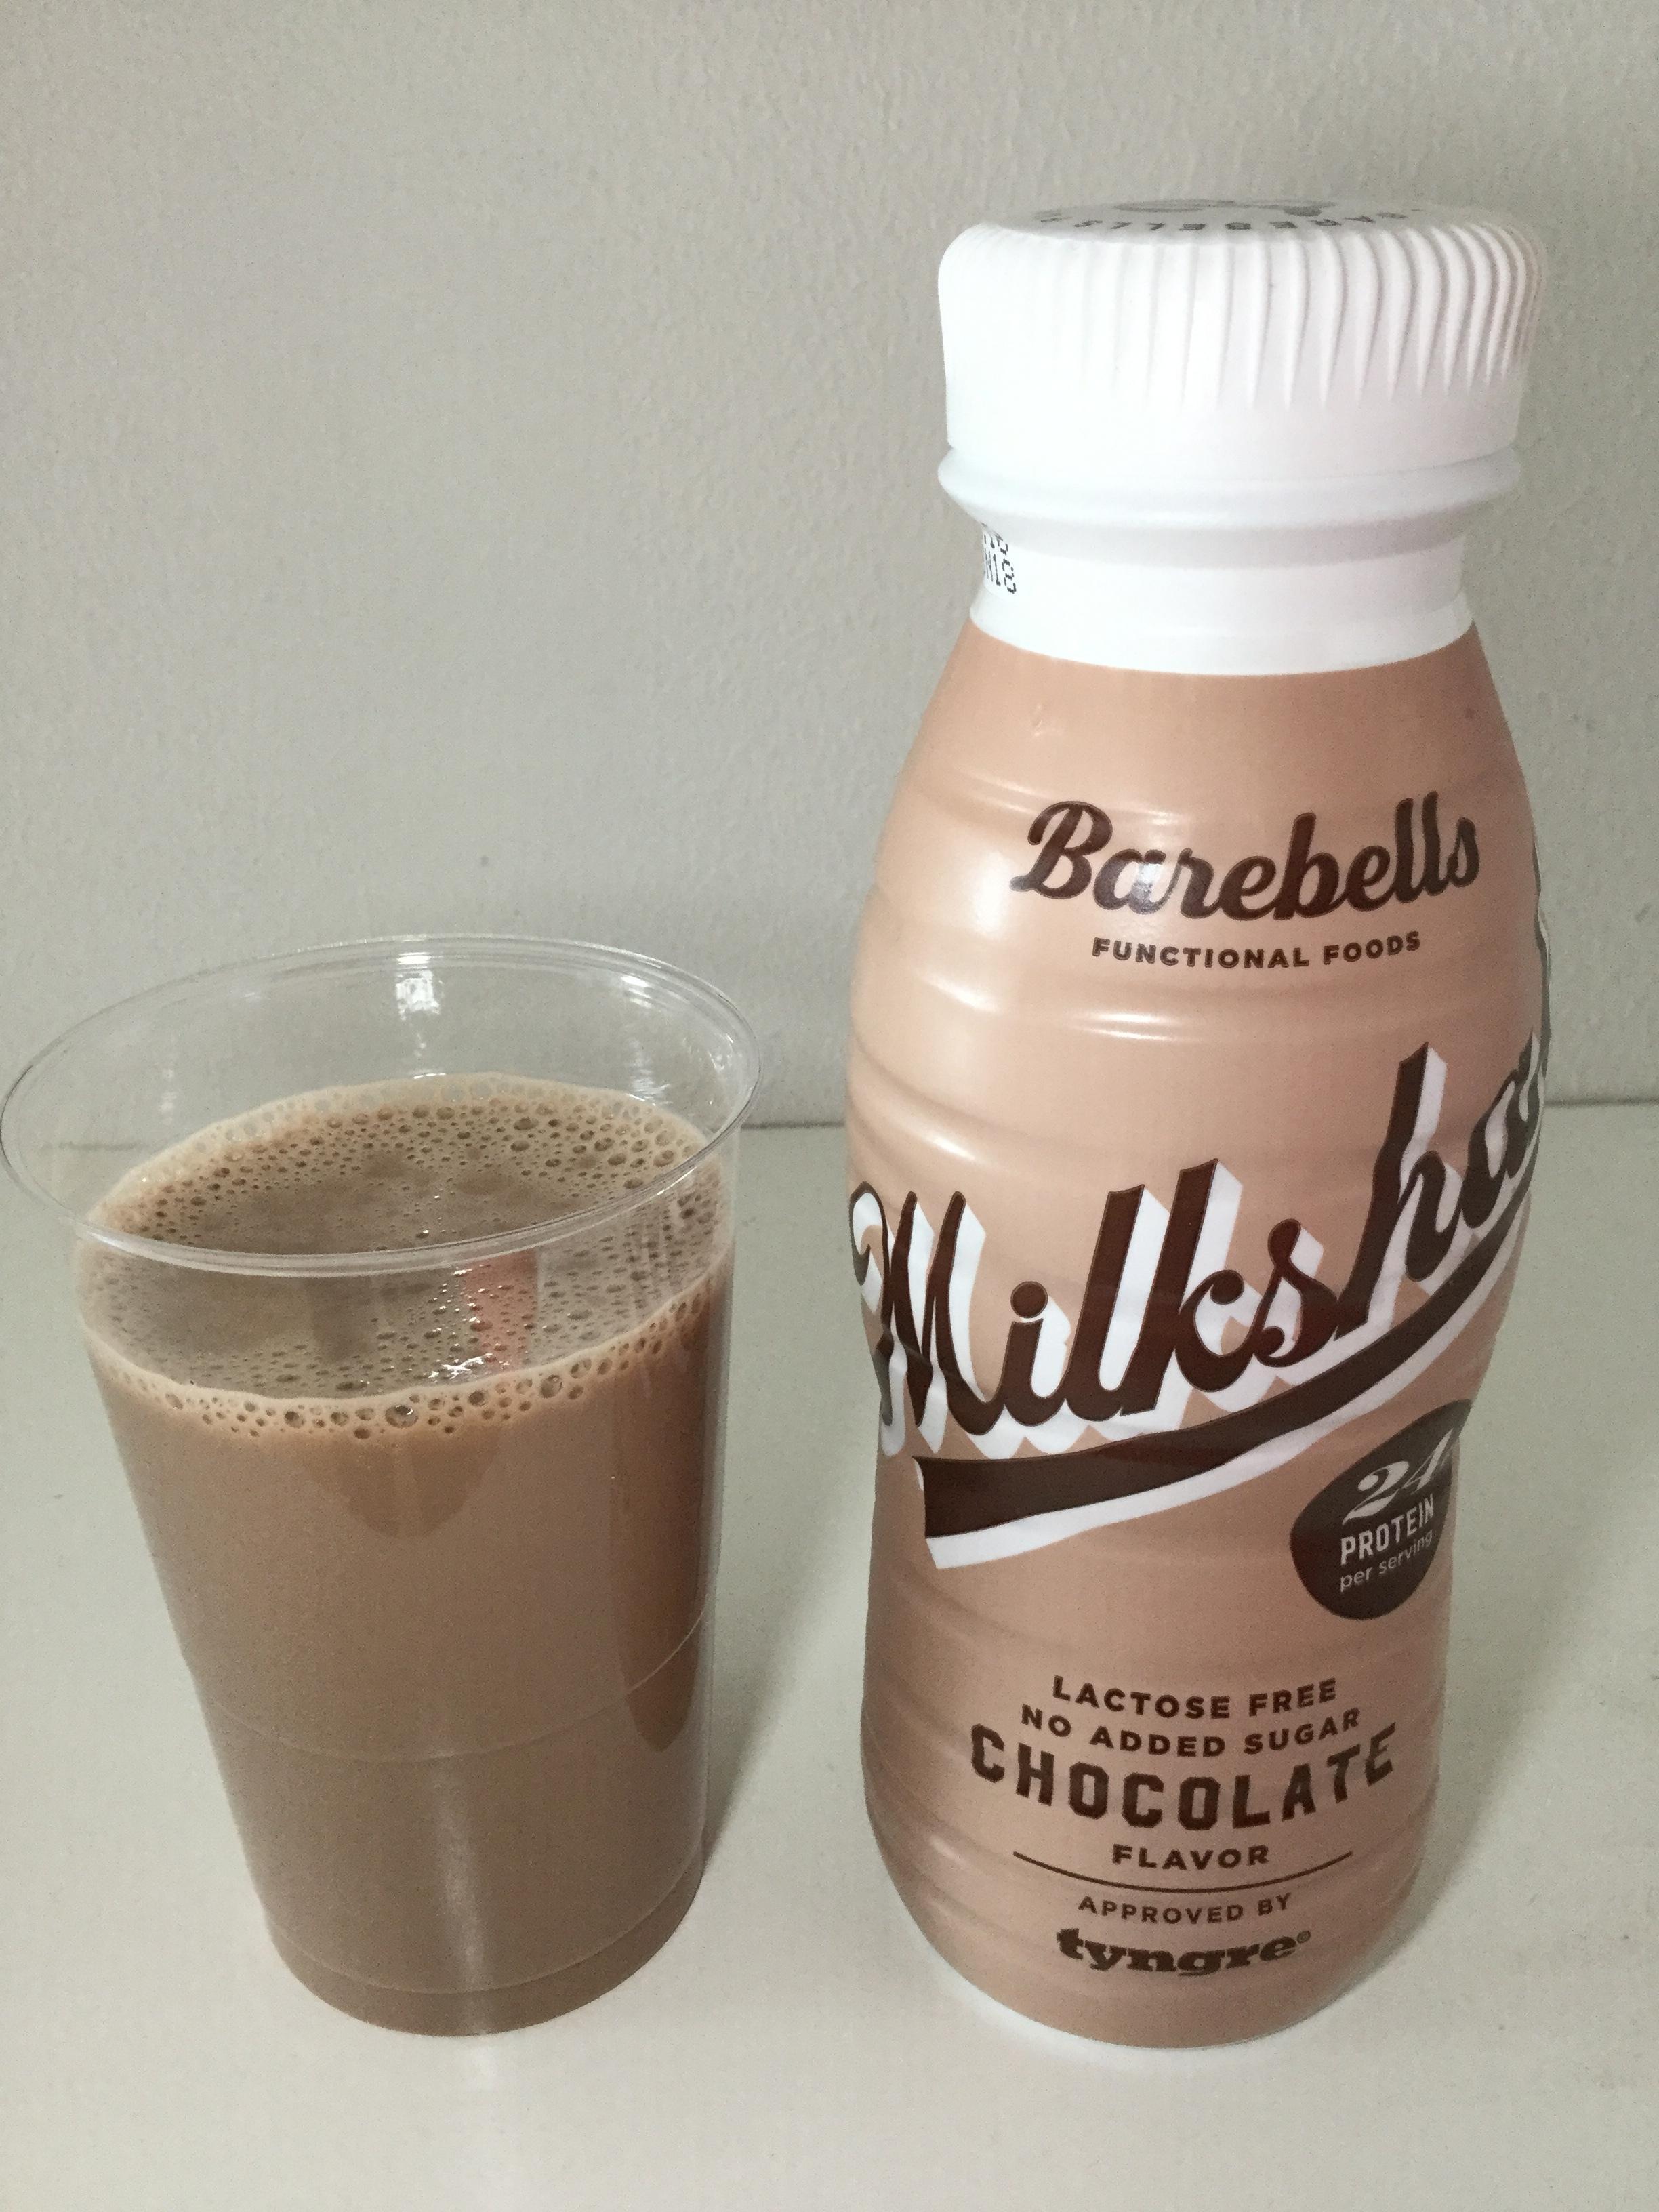 Barebells Chocolate Flavor Milkshake Cup